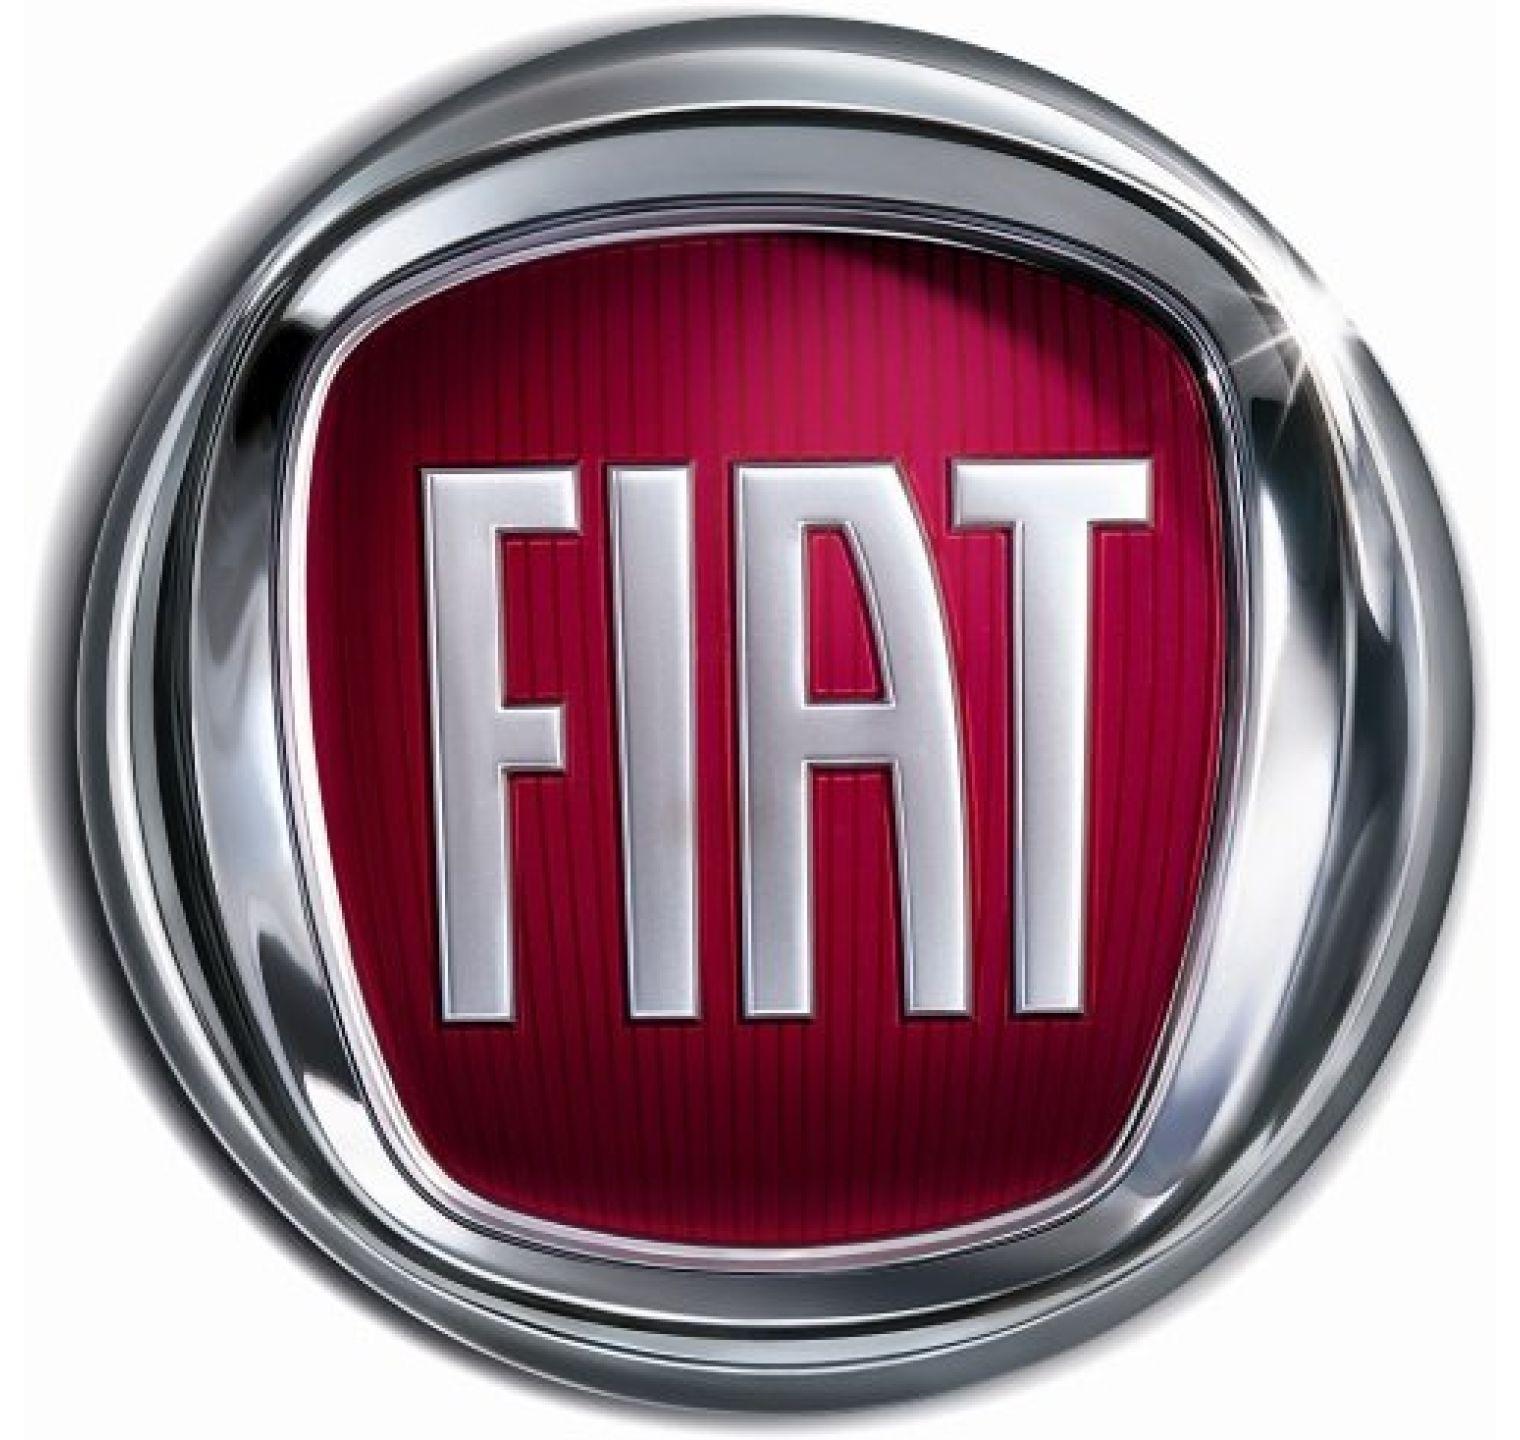 Fiat Punto Van (2008 t/m 2009) - achterruitenwisser Valeo Silencio flatblade